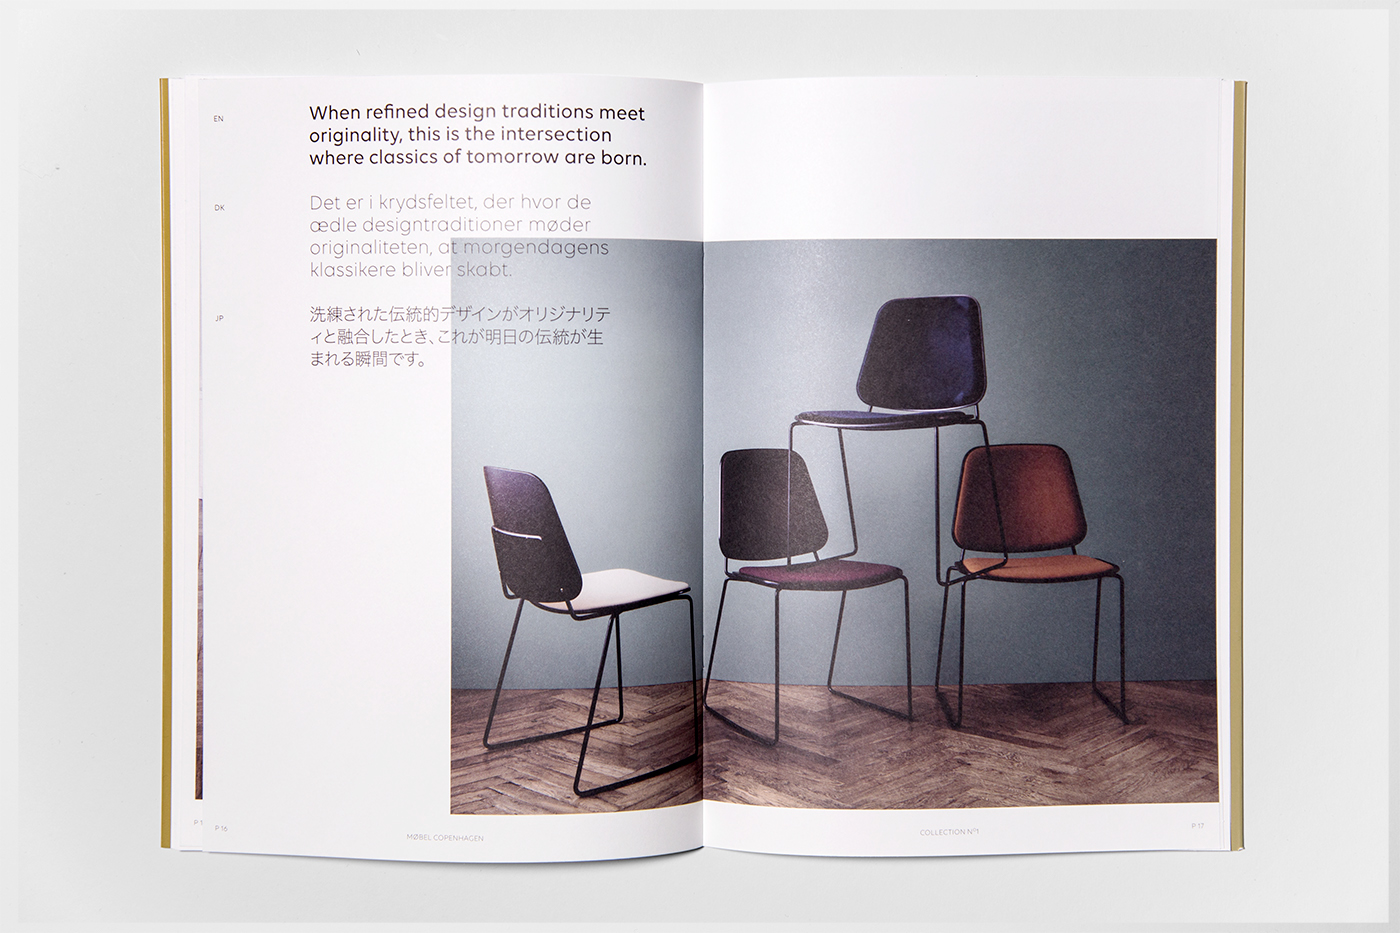 Mbel design kln best xxl mbel kln with xxl mbel kln with mbel sale with office mbel with tecnos - Exquisit mobel koln ...